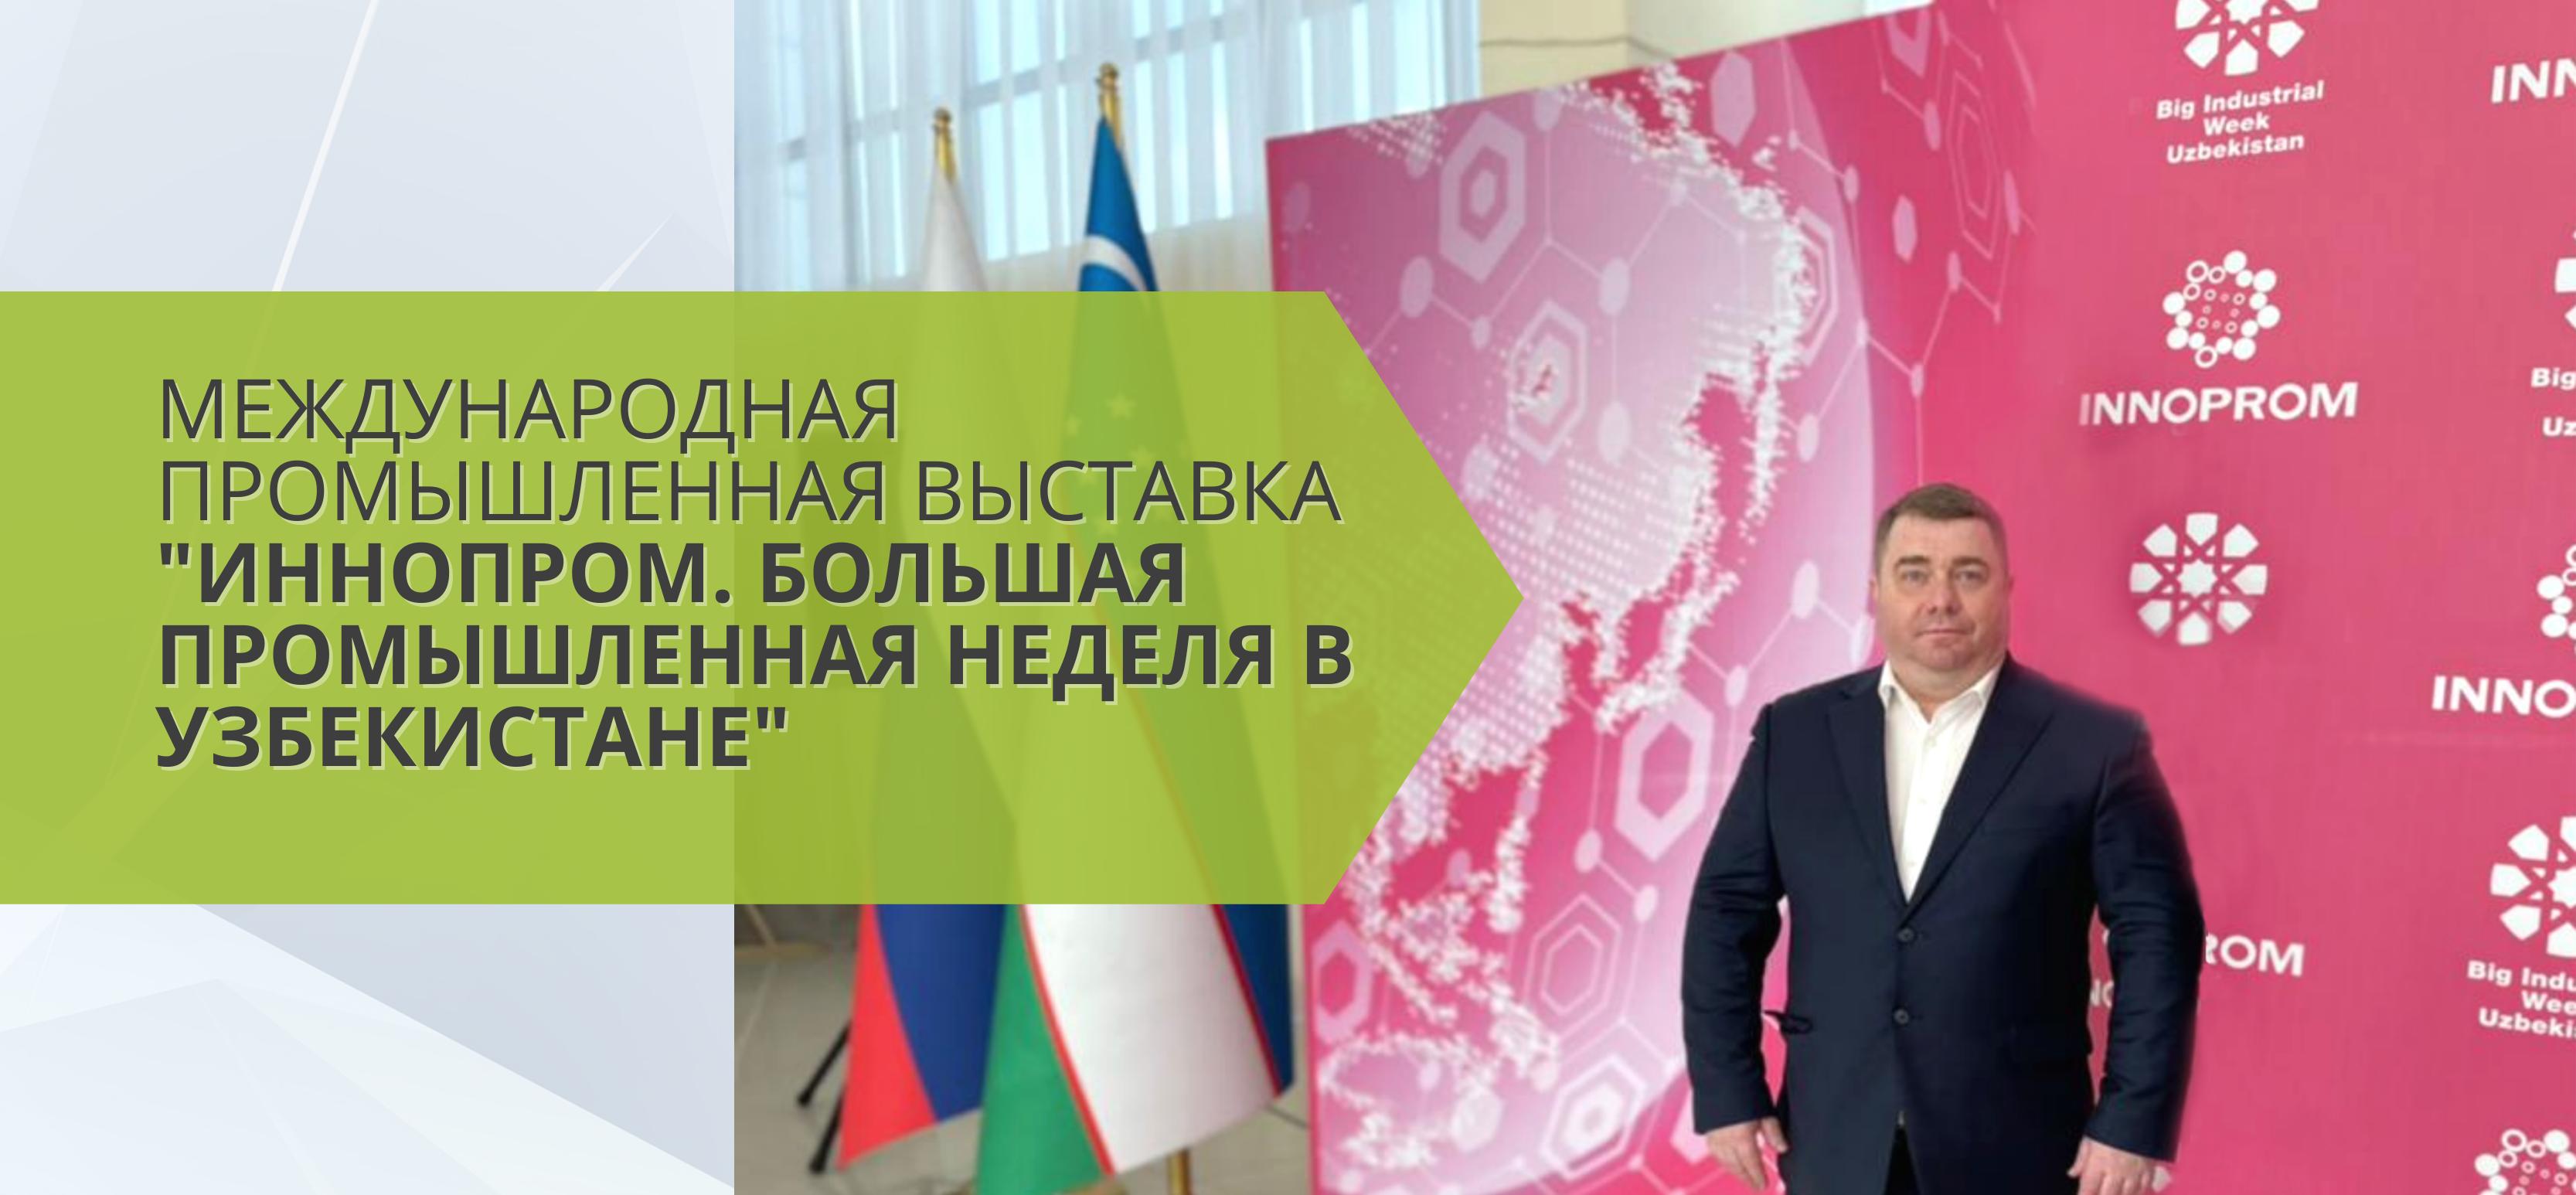 Inpharmatis на выставке «Иннопром» 2021 в Узбекистане